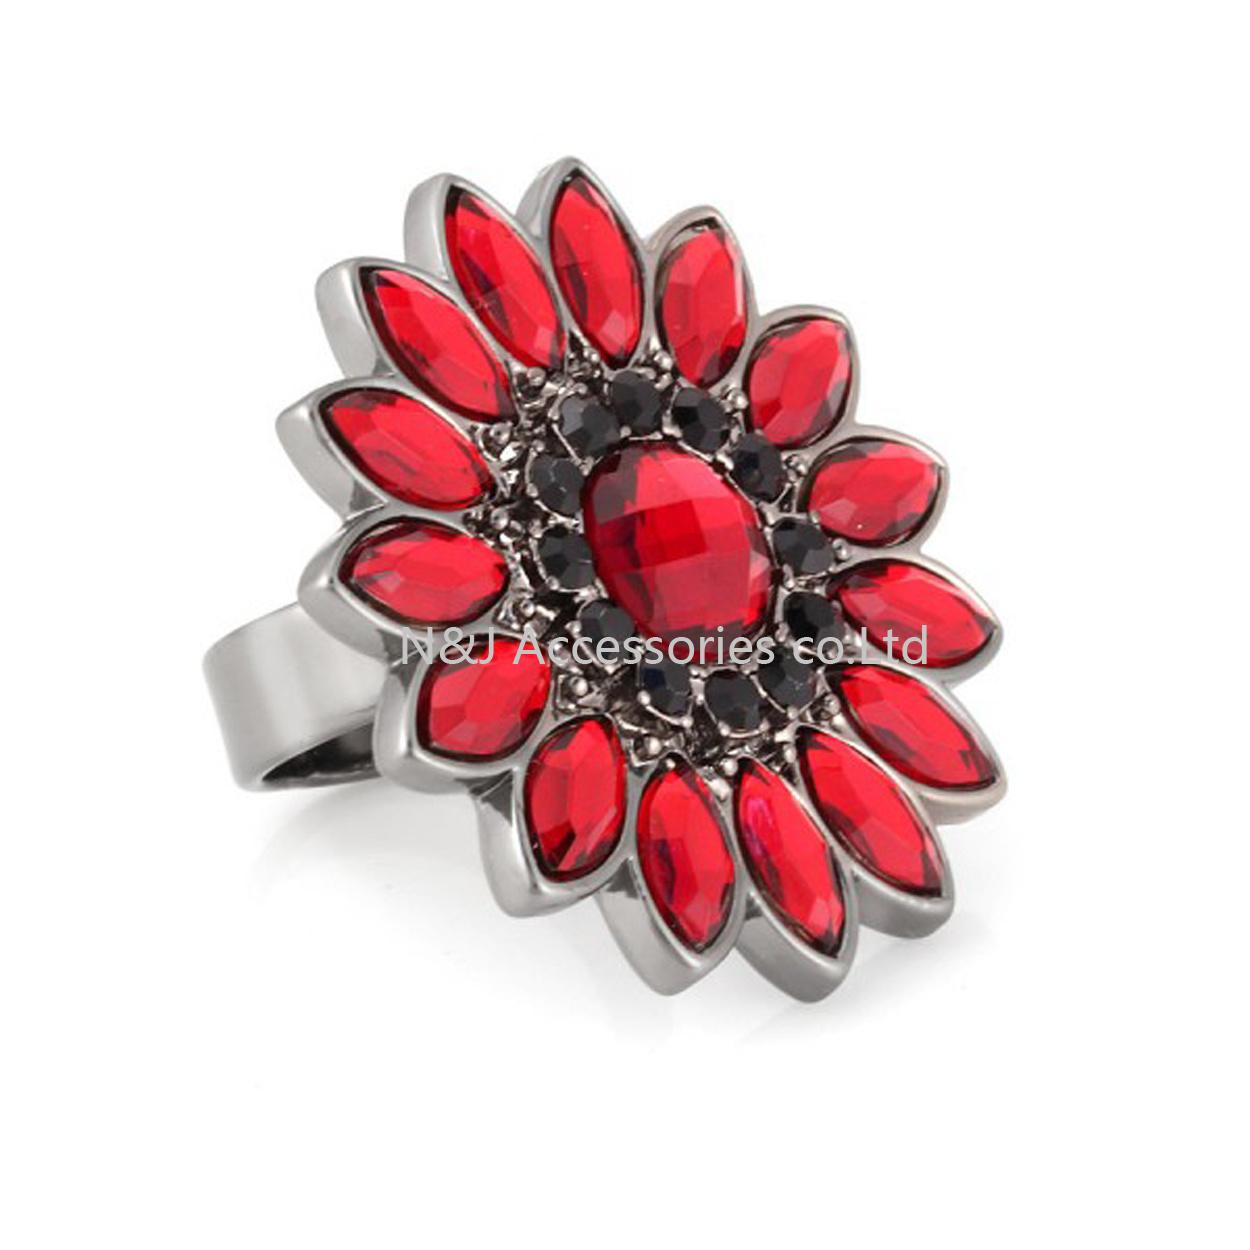 Fashion Black Diamond Red Glass Flower Rings Gun Black Alloy Ring Jewellery